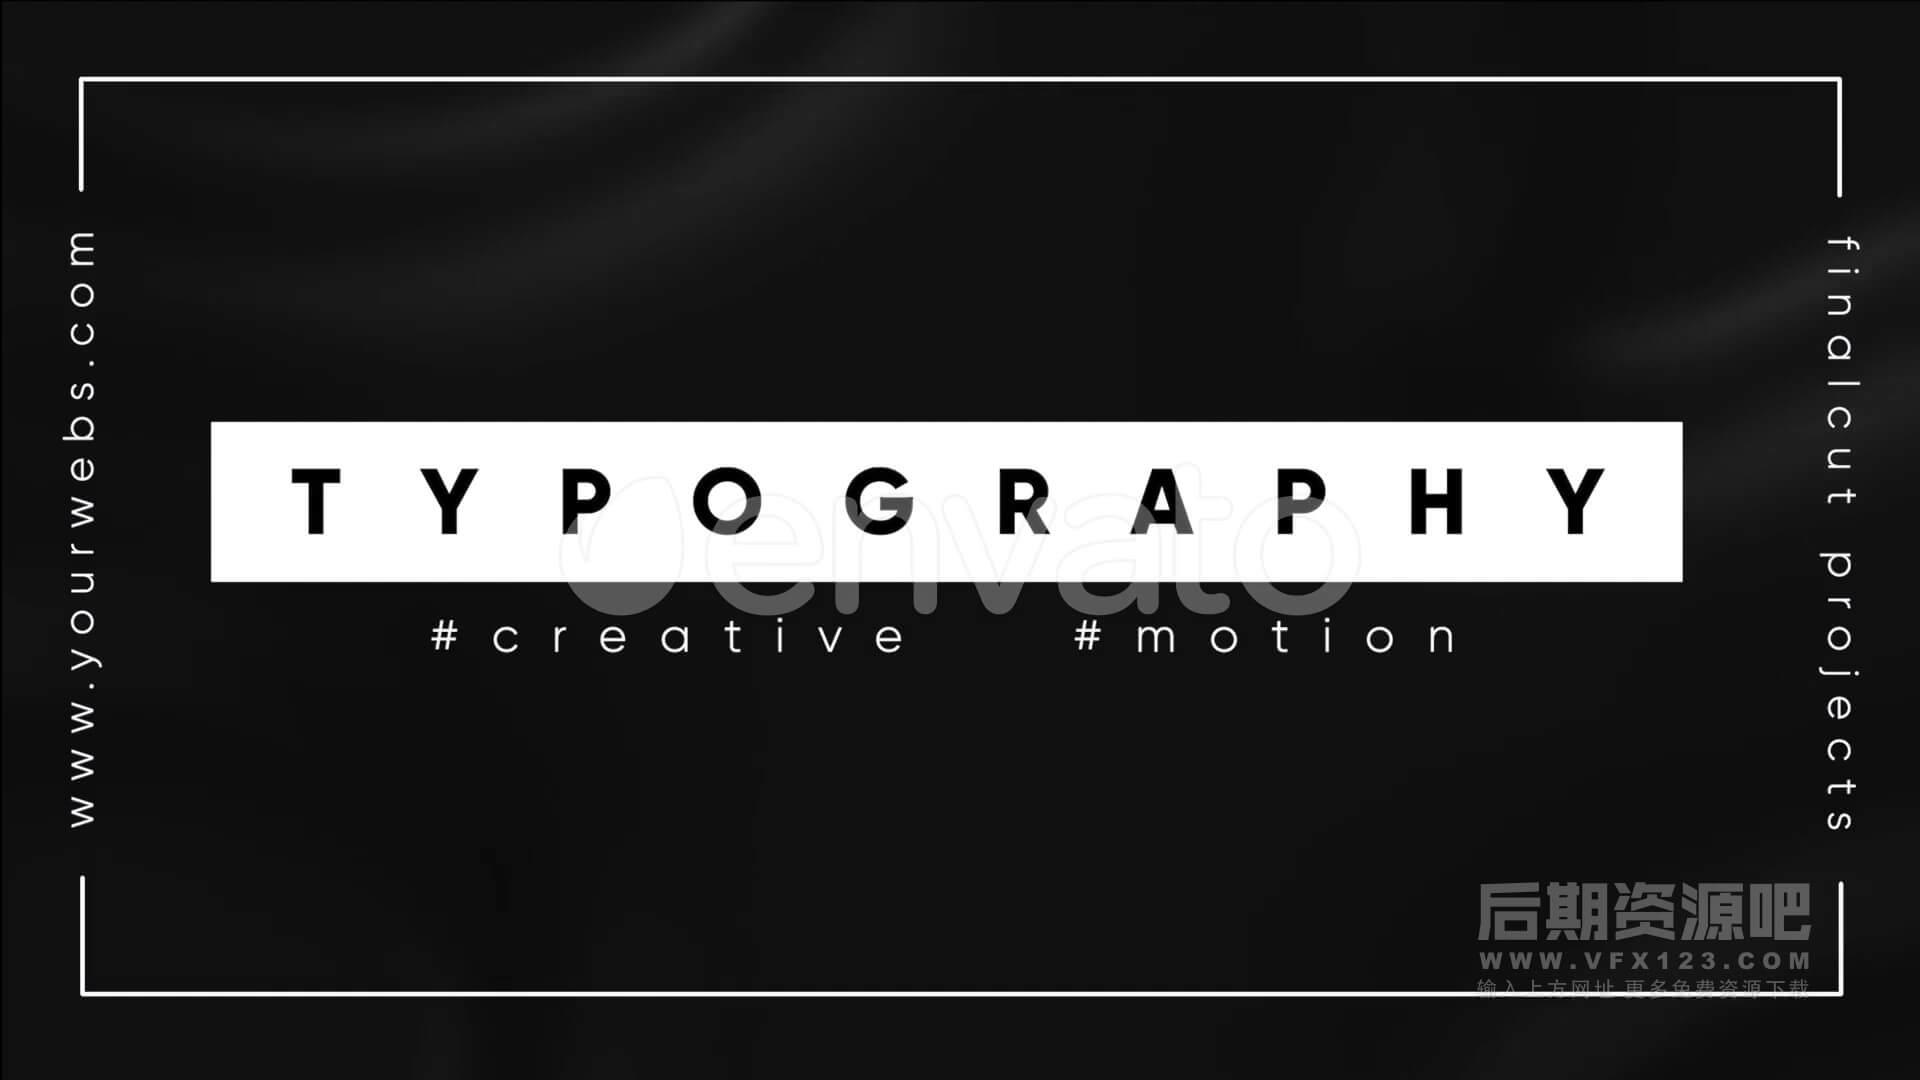 FCPX主题模板 单色黑白风格文字图形排版 Monochrome Typography